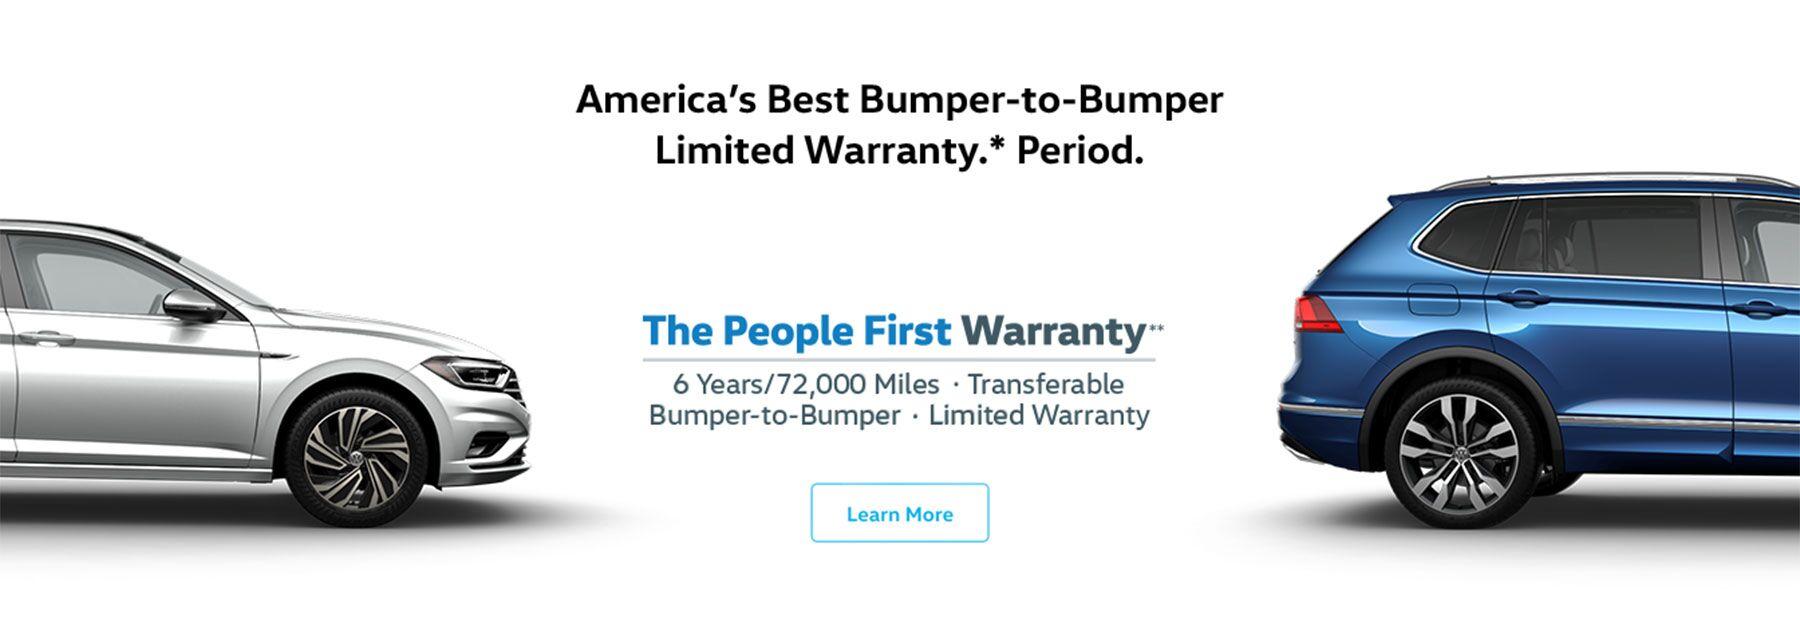 America's best bumper-to-bumper limited warranty. Period.